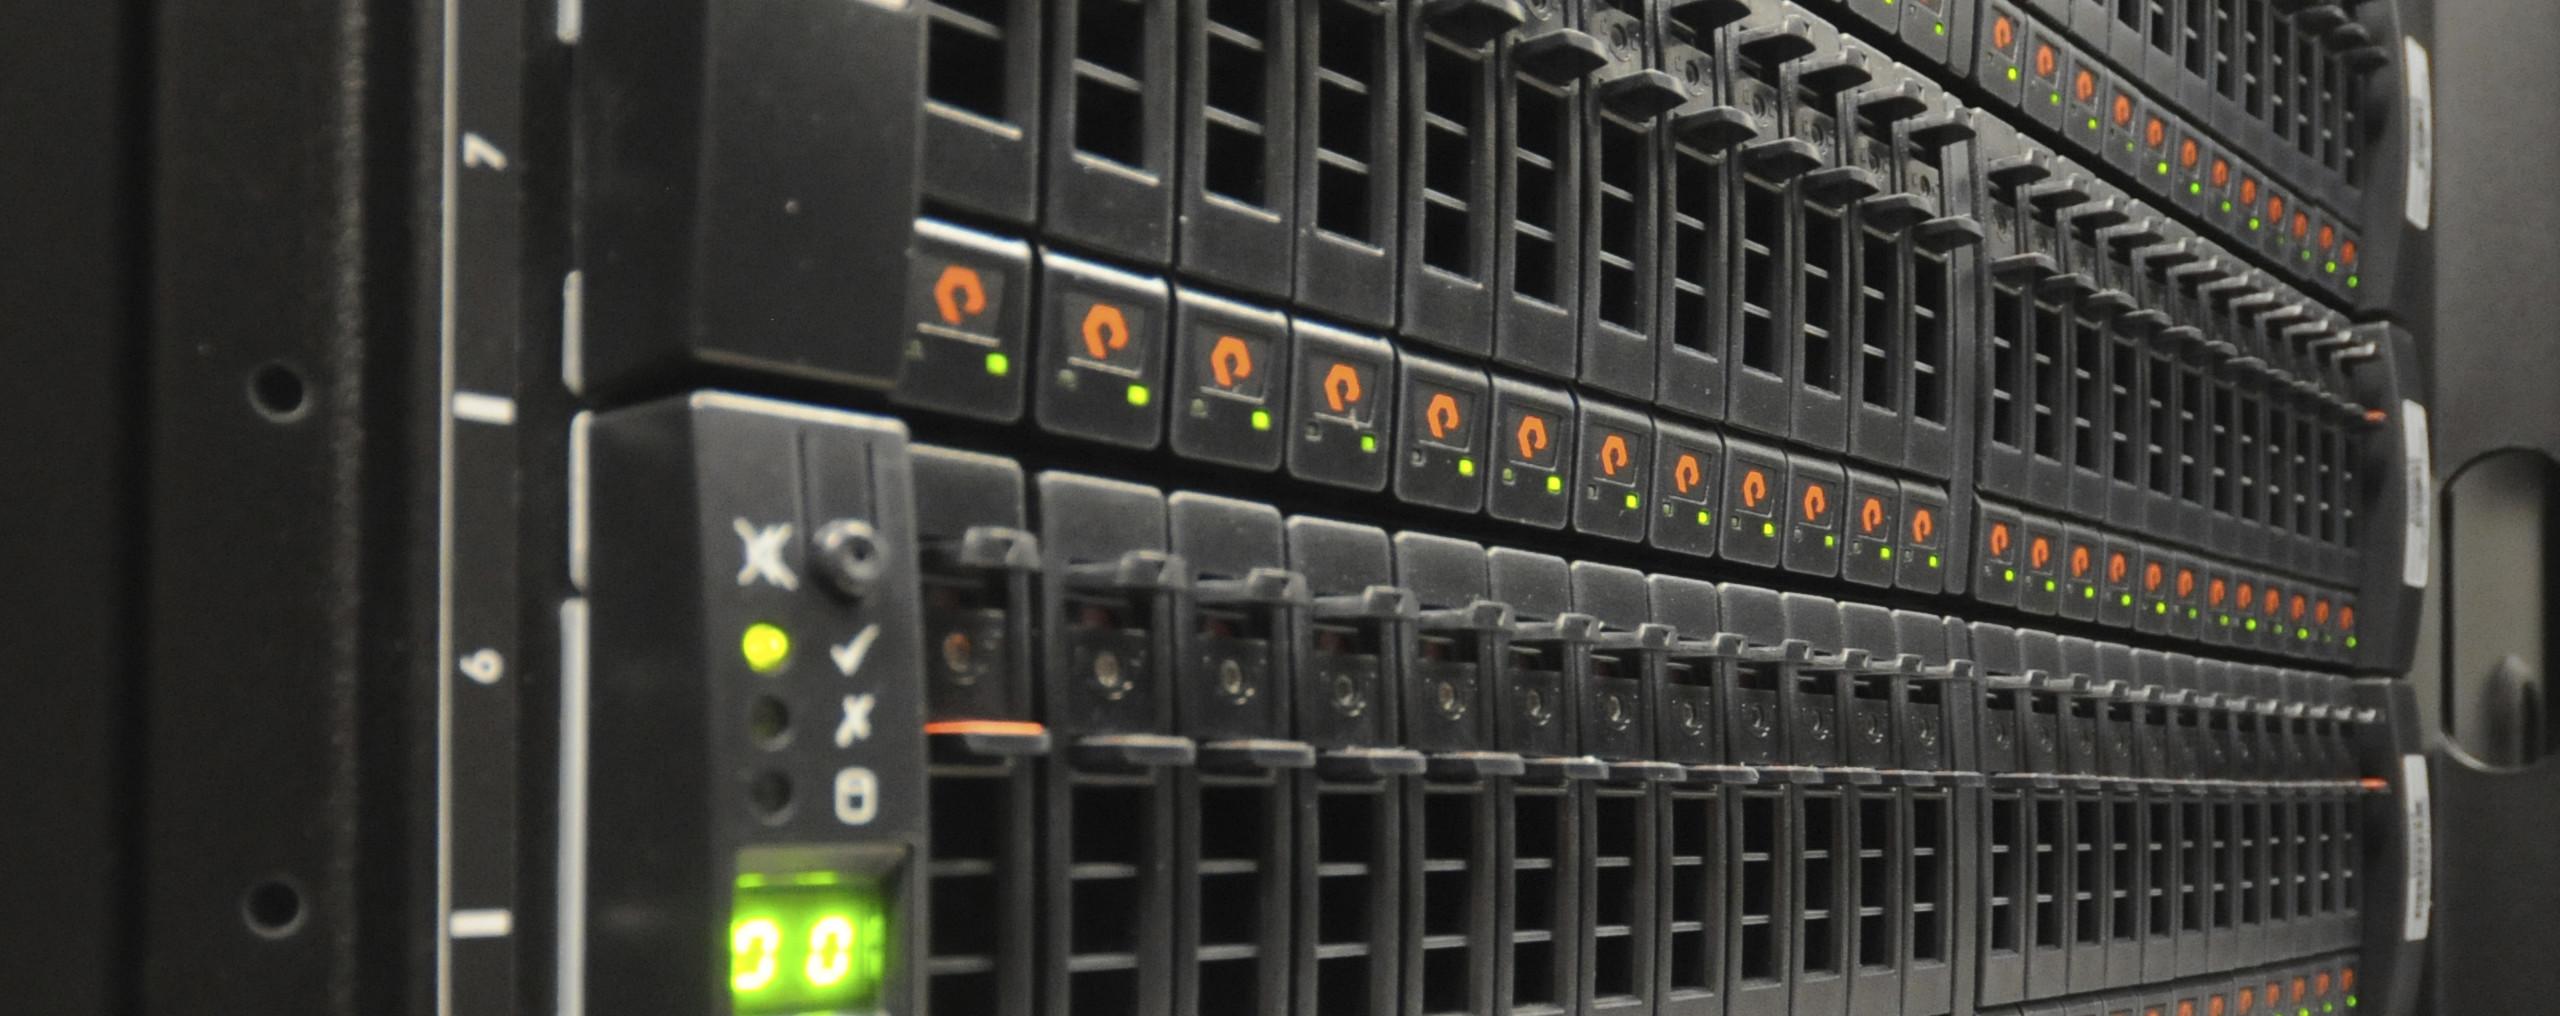 Managed security, de ideale uitbreiding op managed hosting.